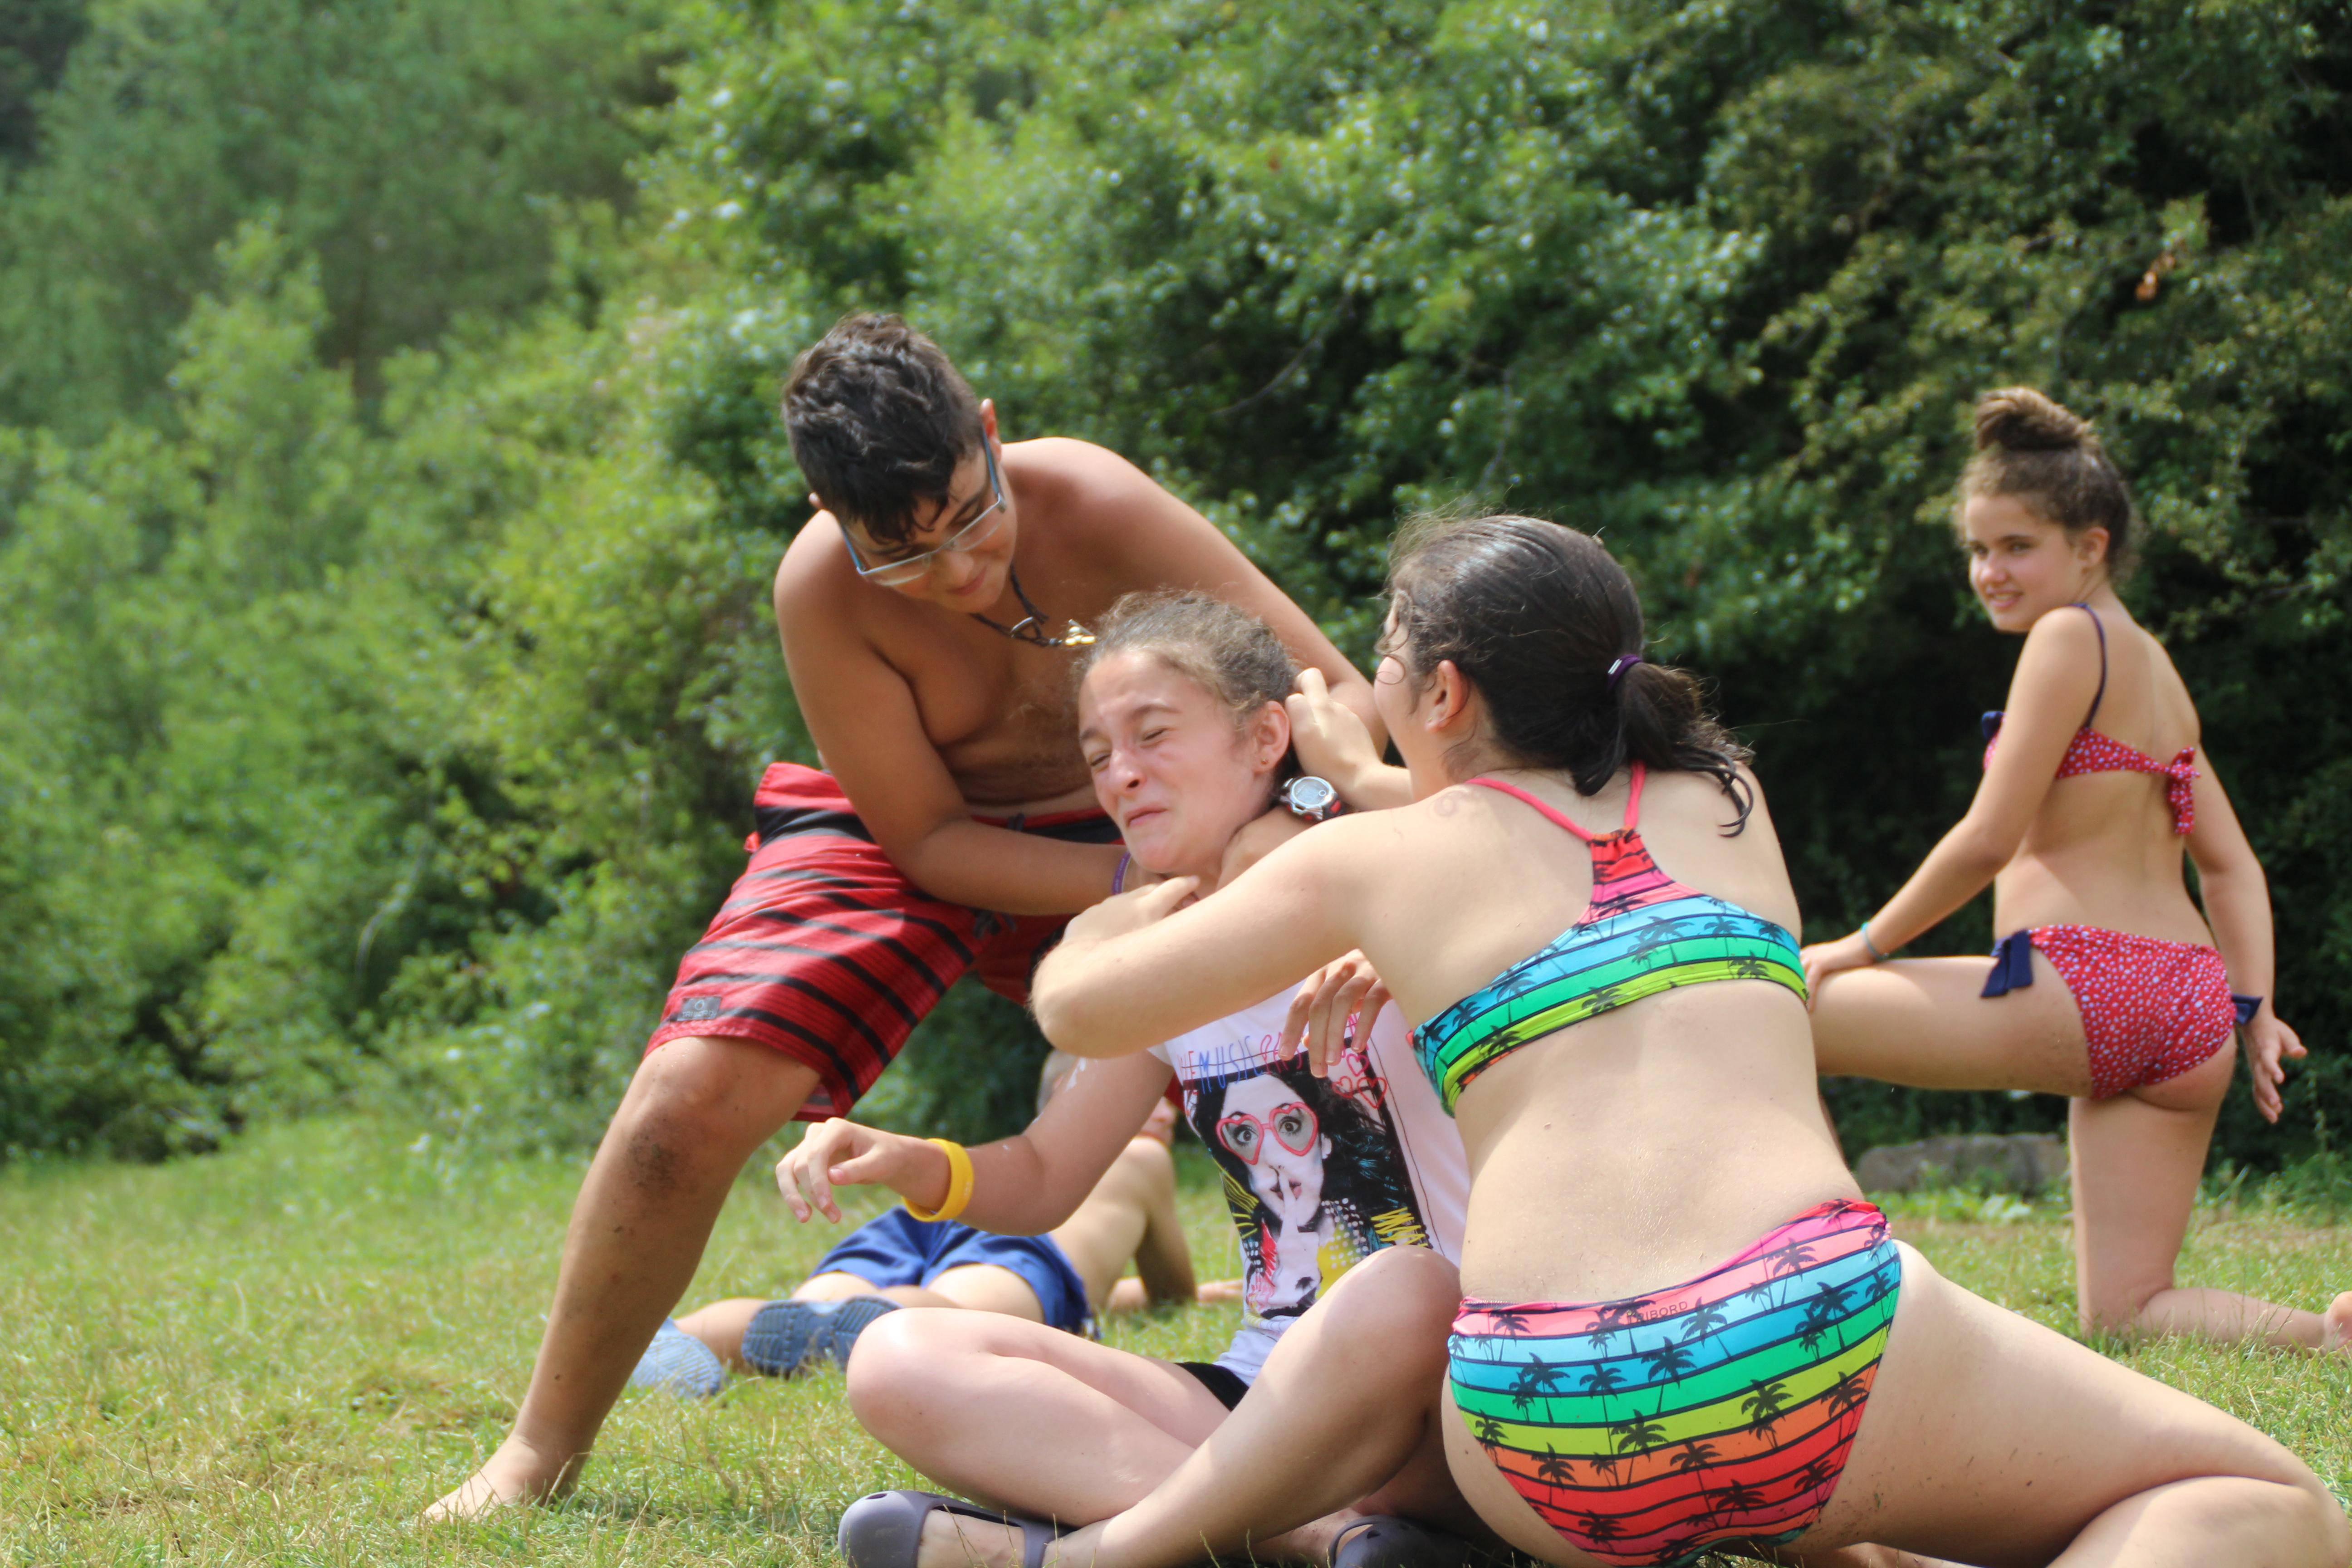 15-16 - Grupo - Campamento de verano - P182